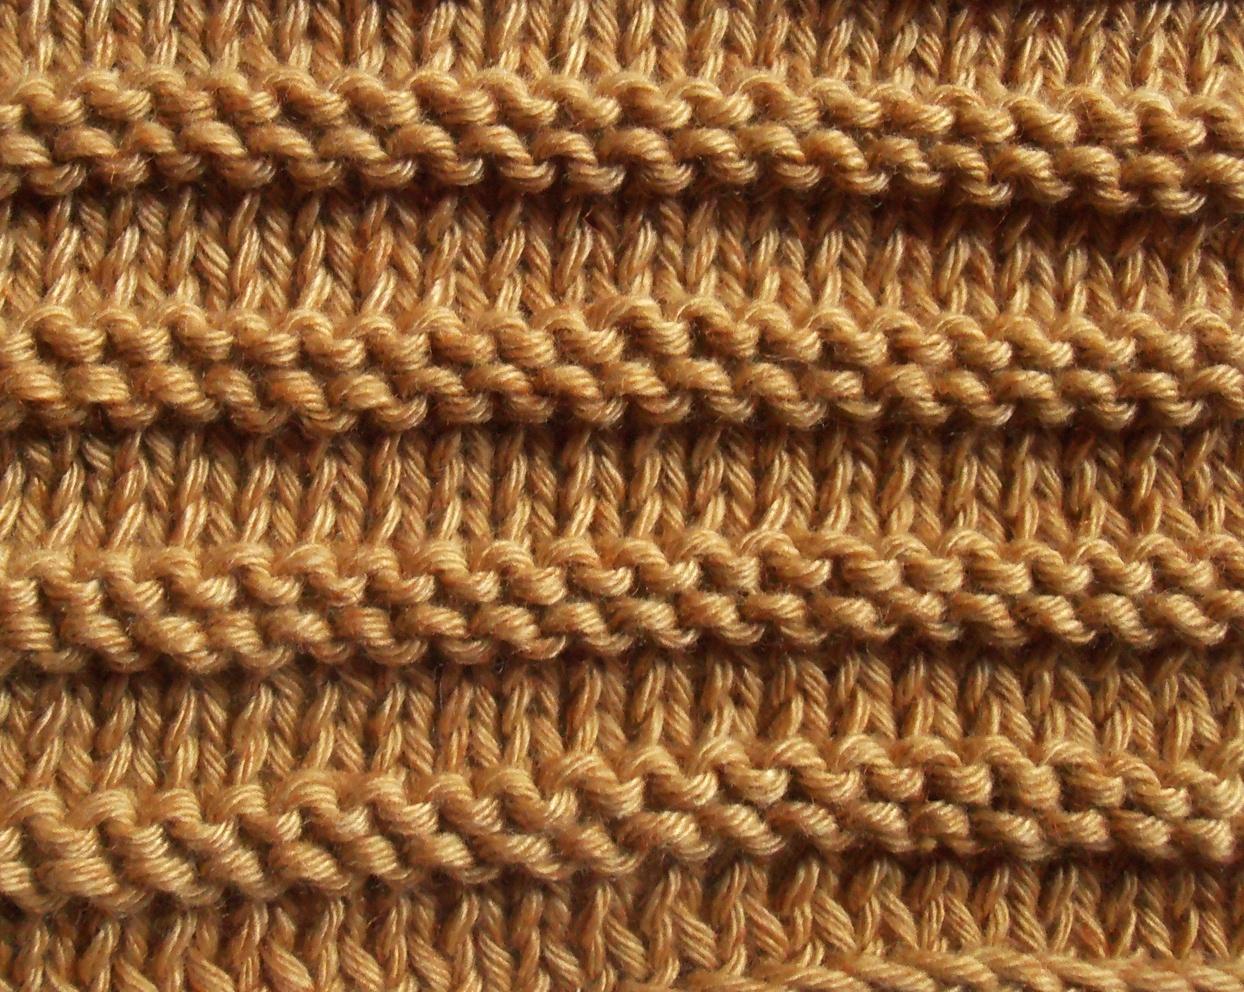 Tricoter jersey endroit